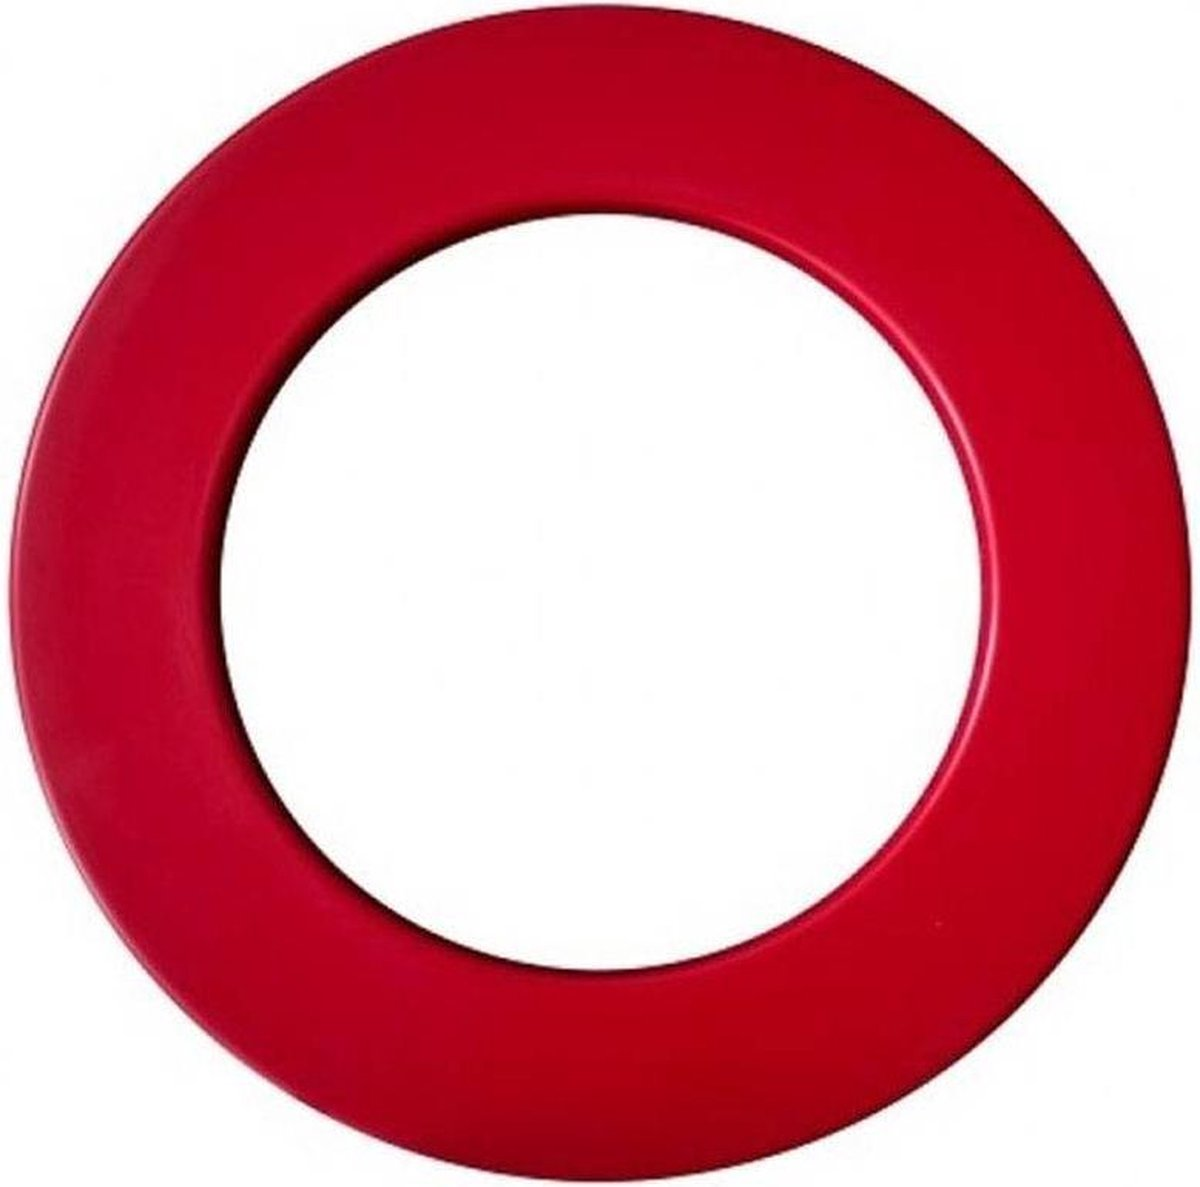 Bull's Surround Ring - Rood